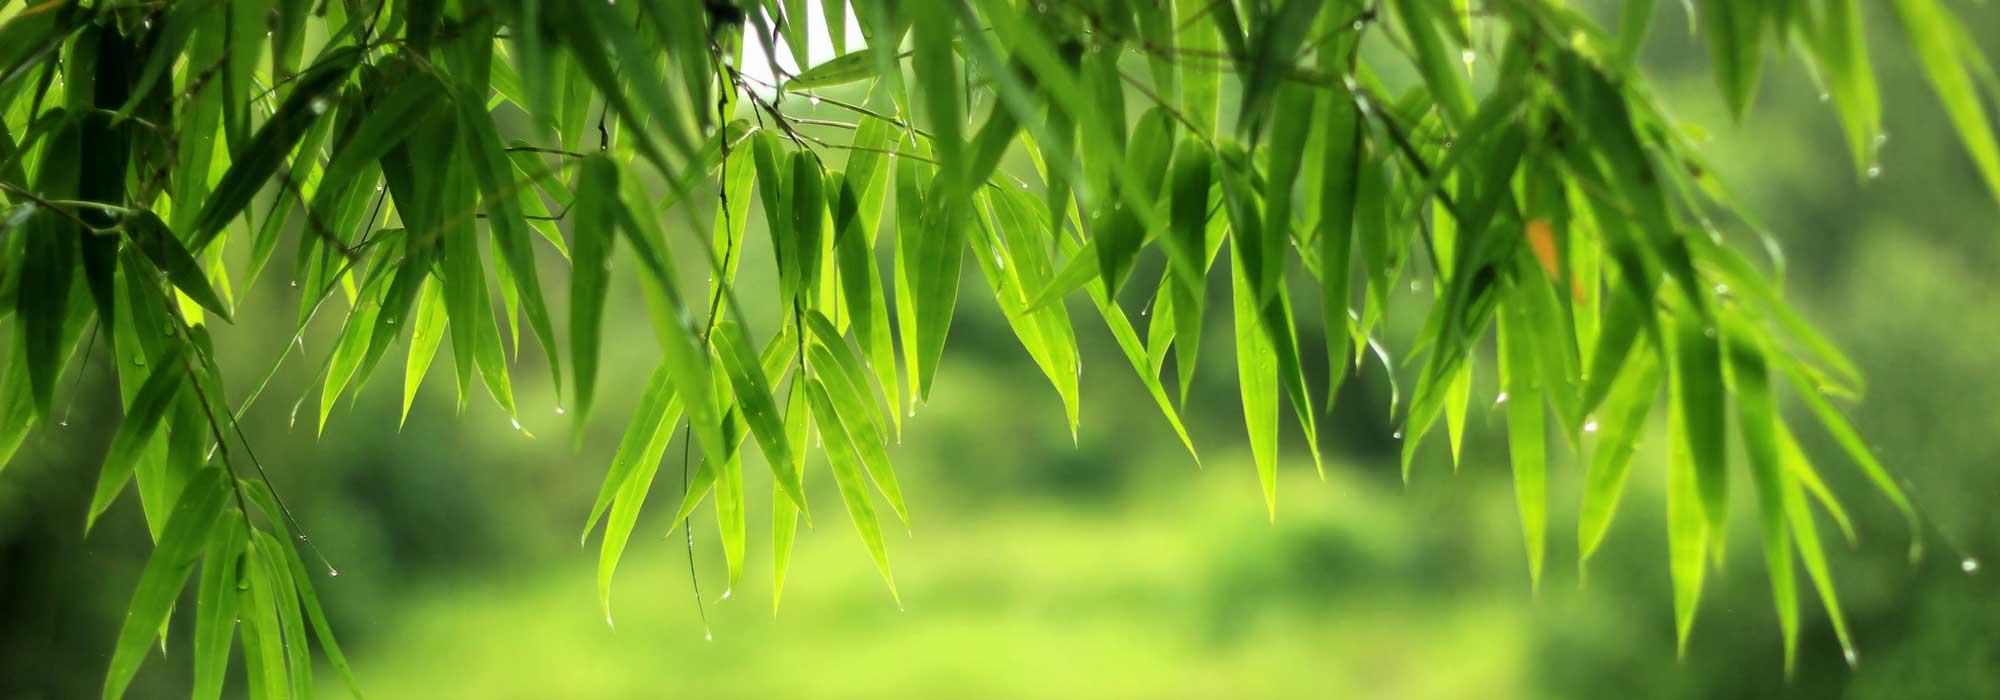 bambou planter tailler et entretenir nos conseils promesse de fleurs. Black Bedroom Furniture Sets. Home Design Ideas